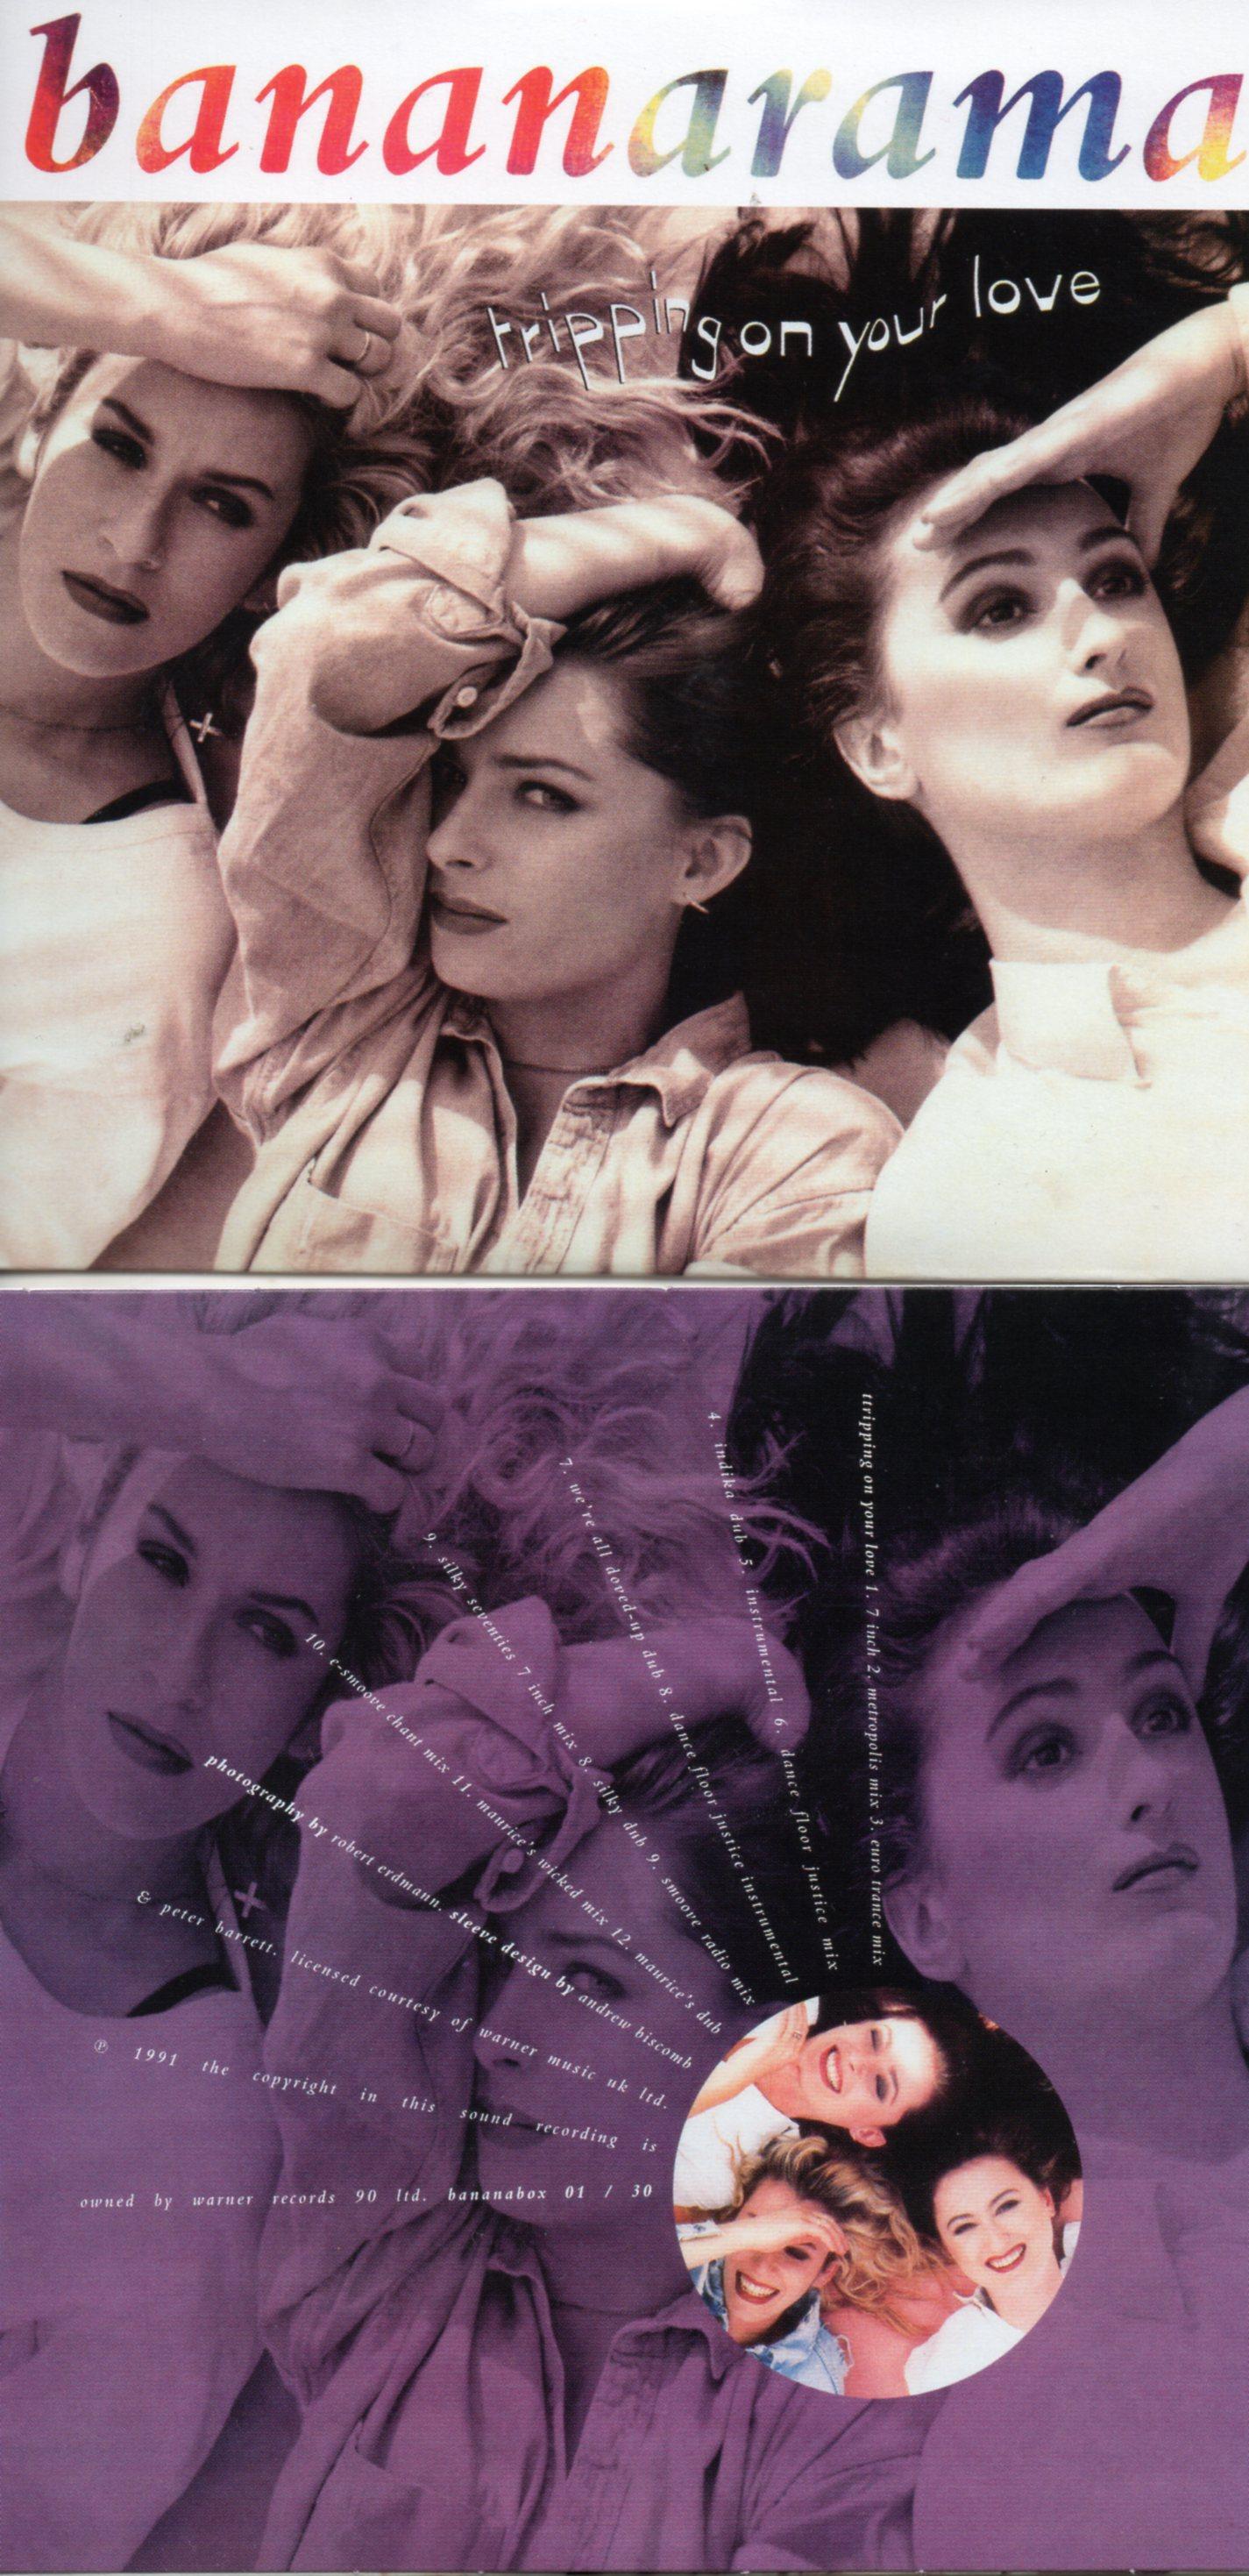 BANANARAMA - TRIPPING ON YOUR LOVE (1991) 14-TRACK CARD SLEEVE - CD single